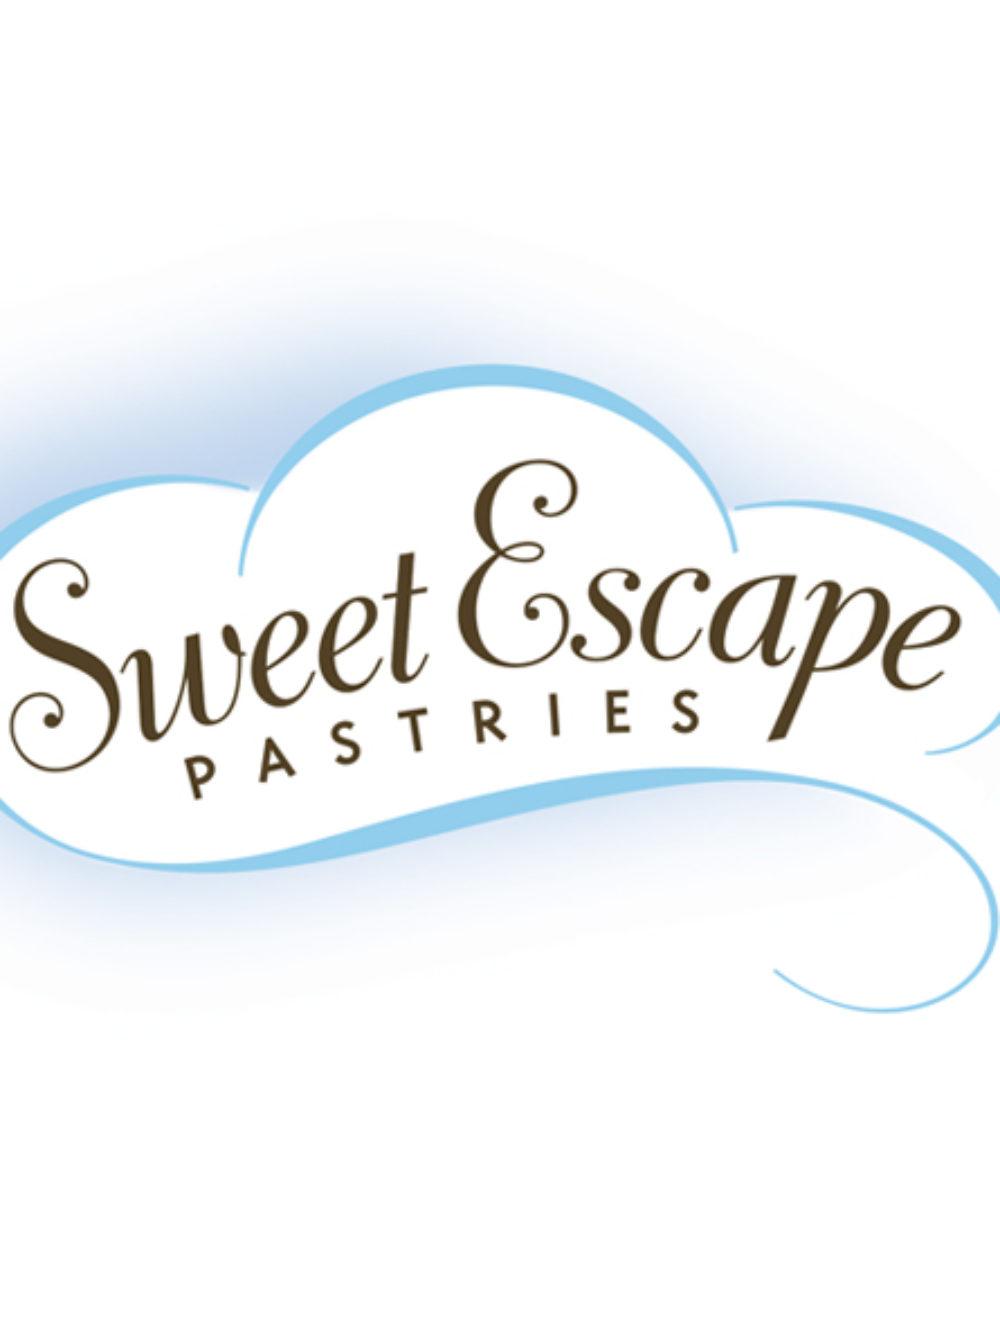 Open Design logo_ Sweet Esape Pastries